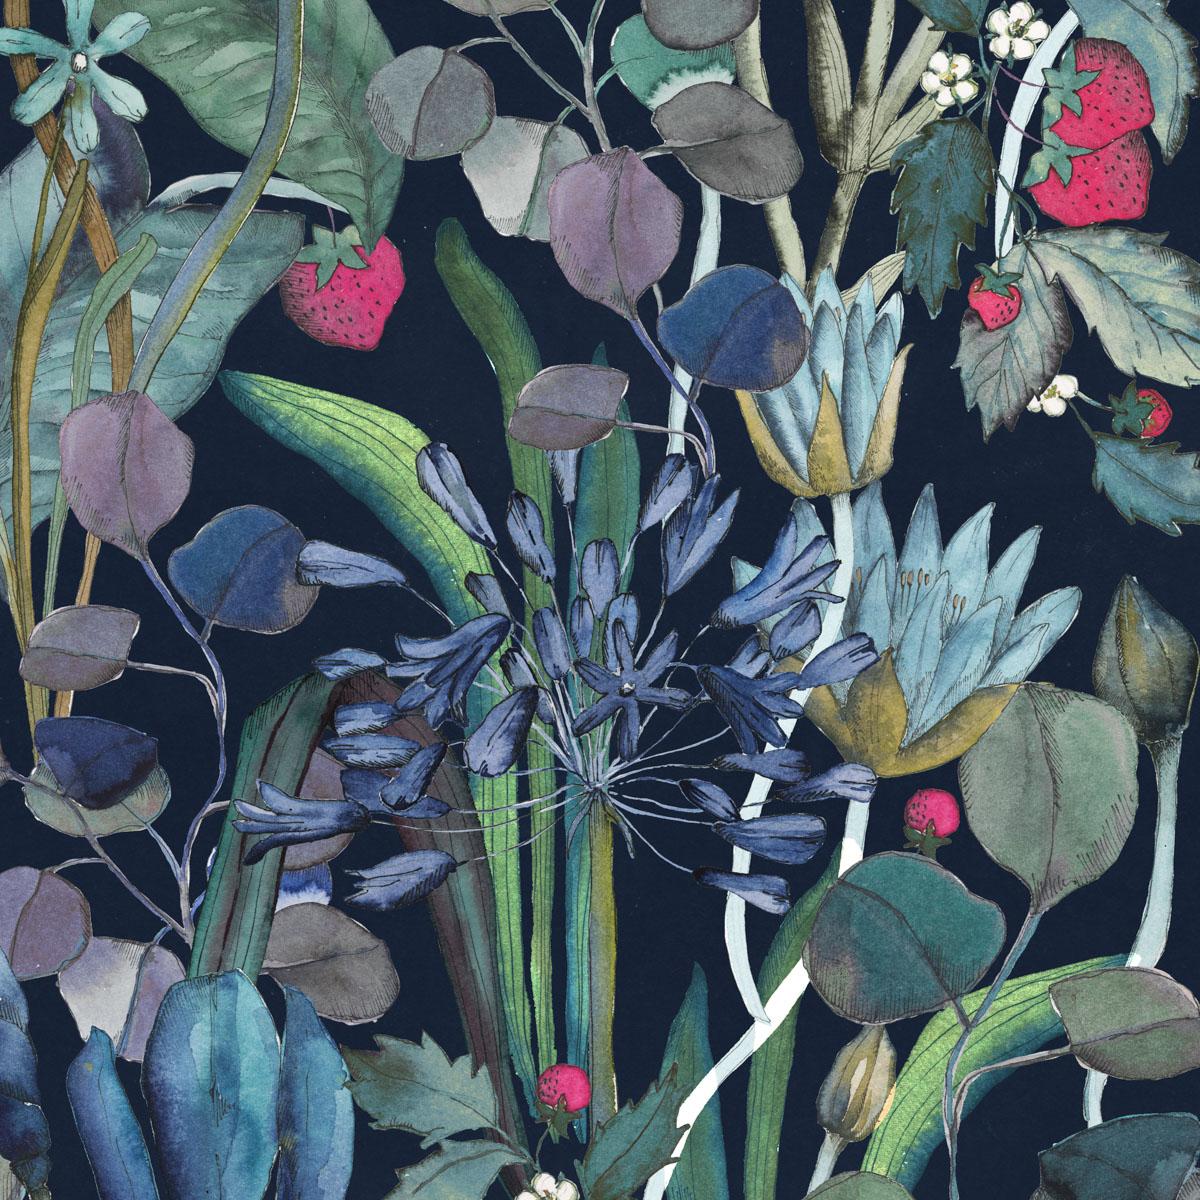 marta cortese_textile designer_terratinta_sartoria_02_detail